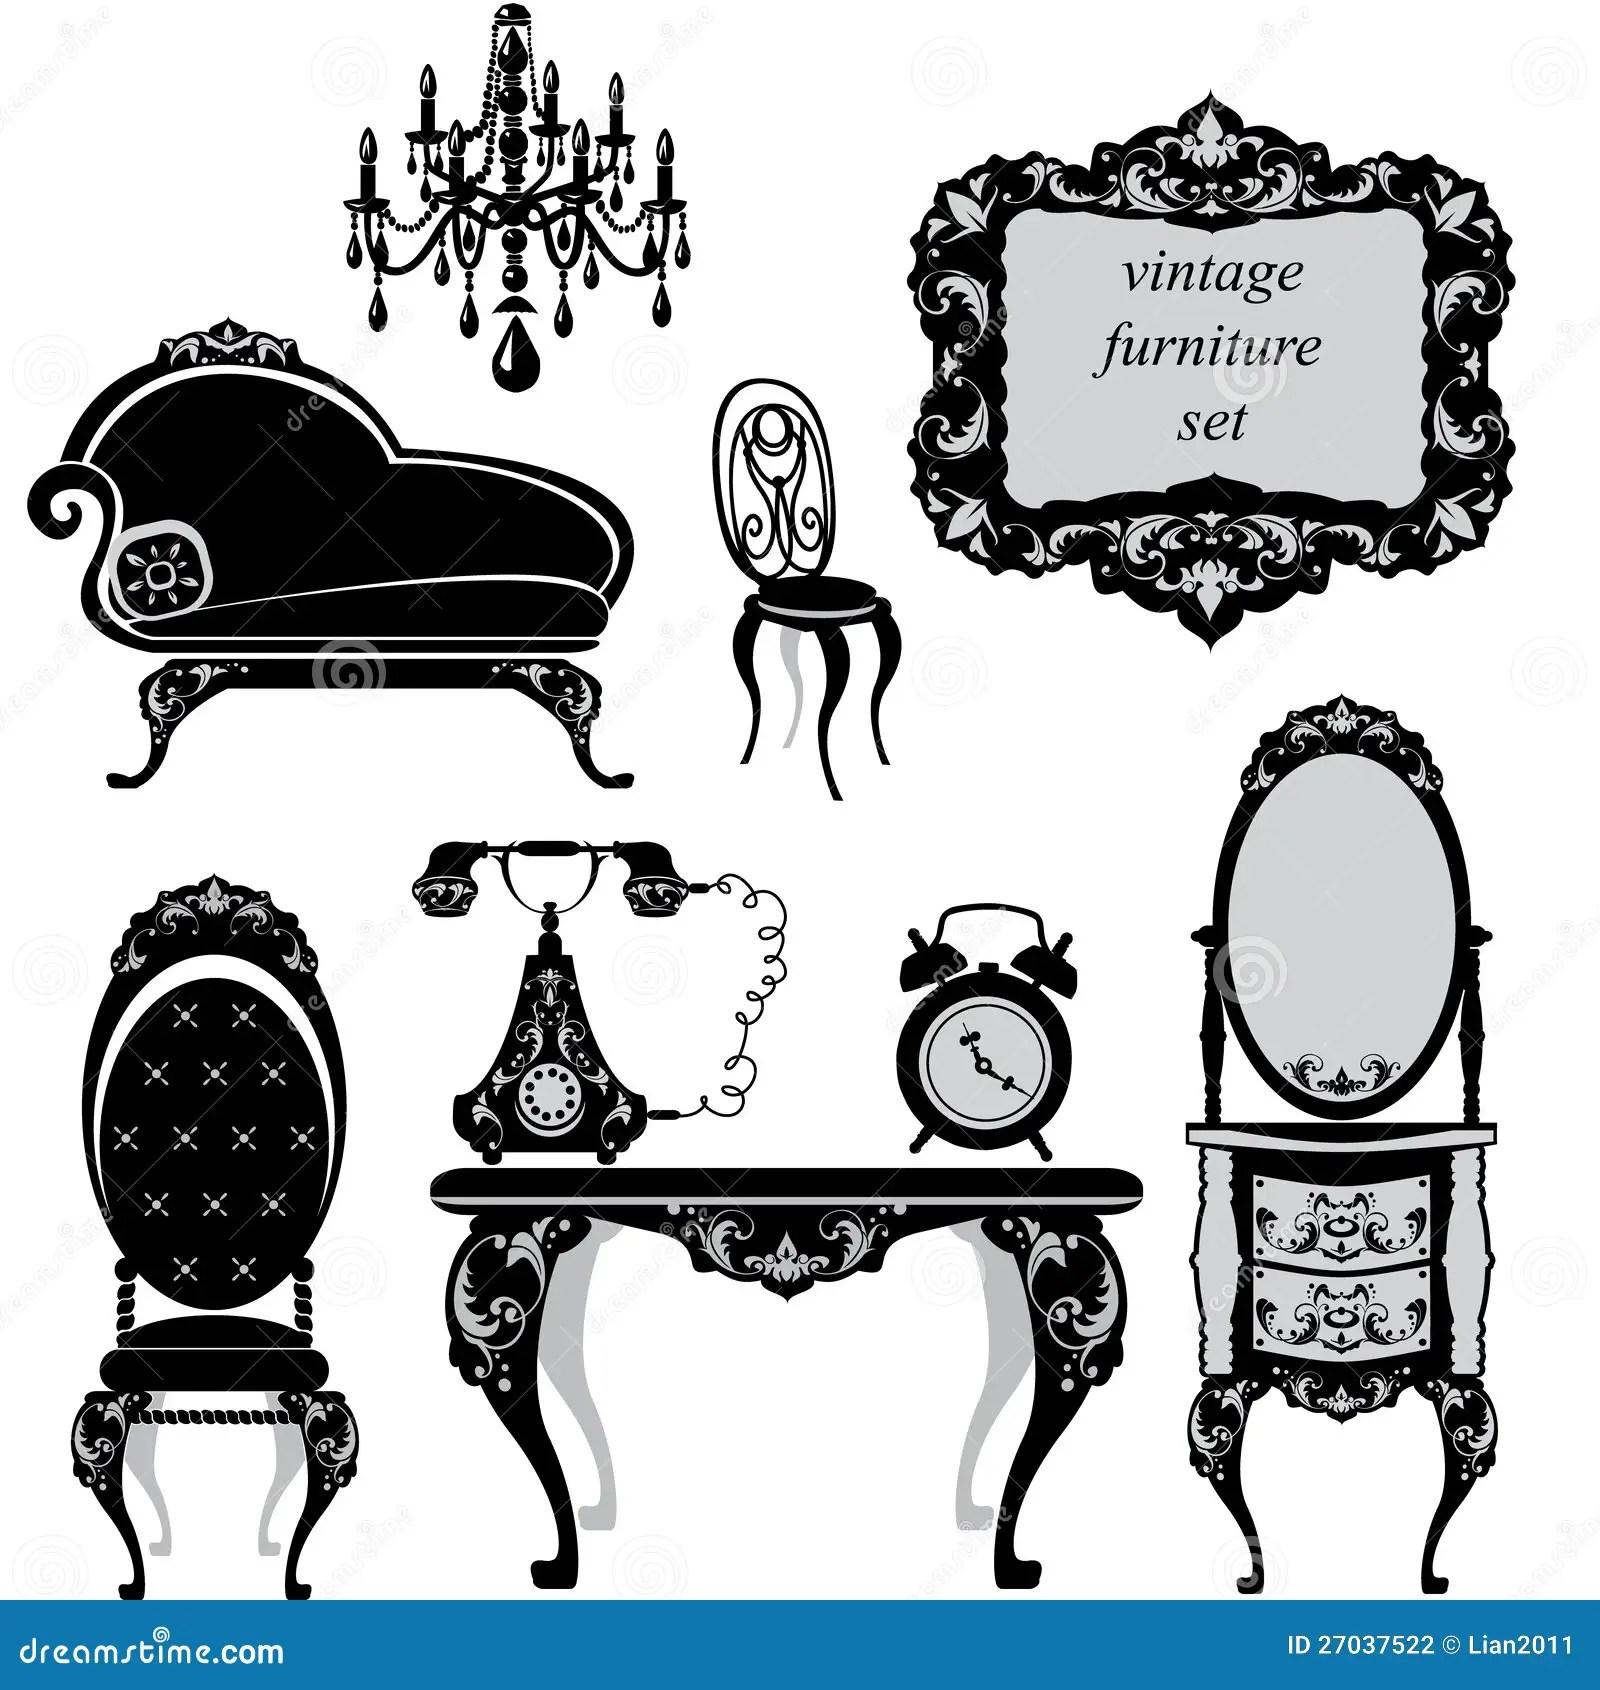 Set of antique furniture stock vector. Illustration of